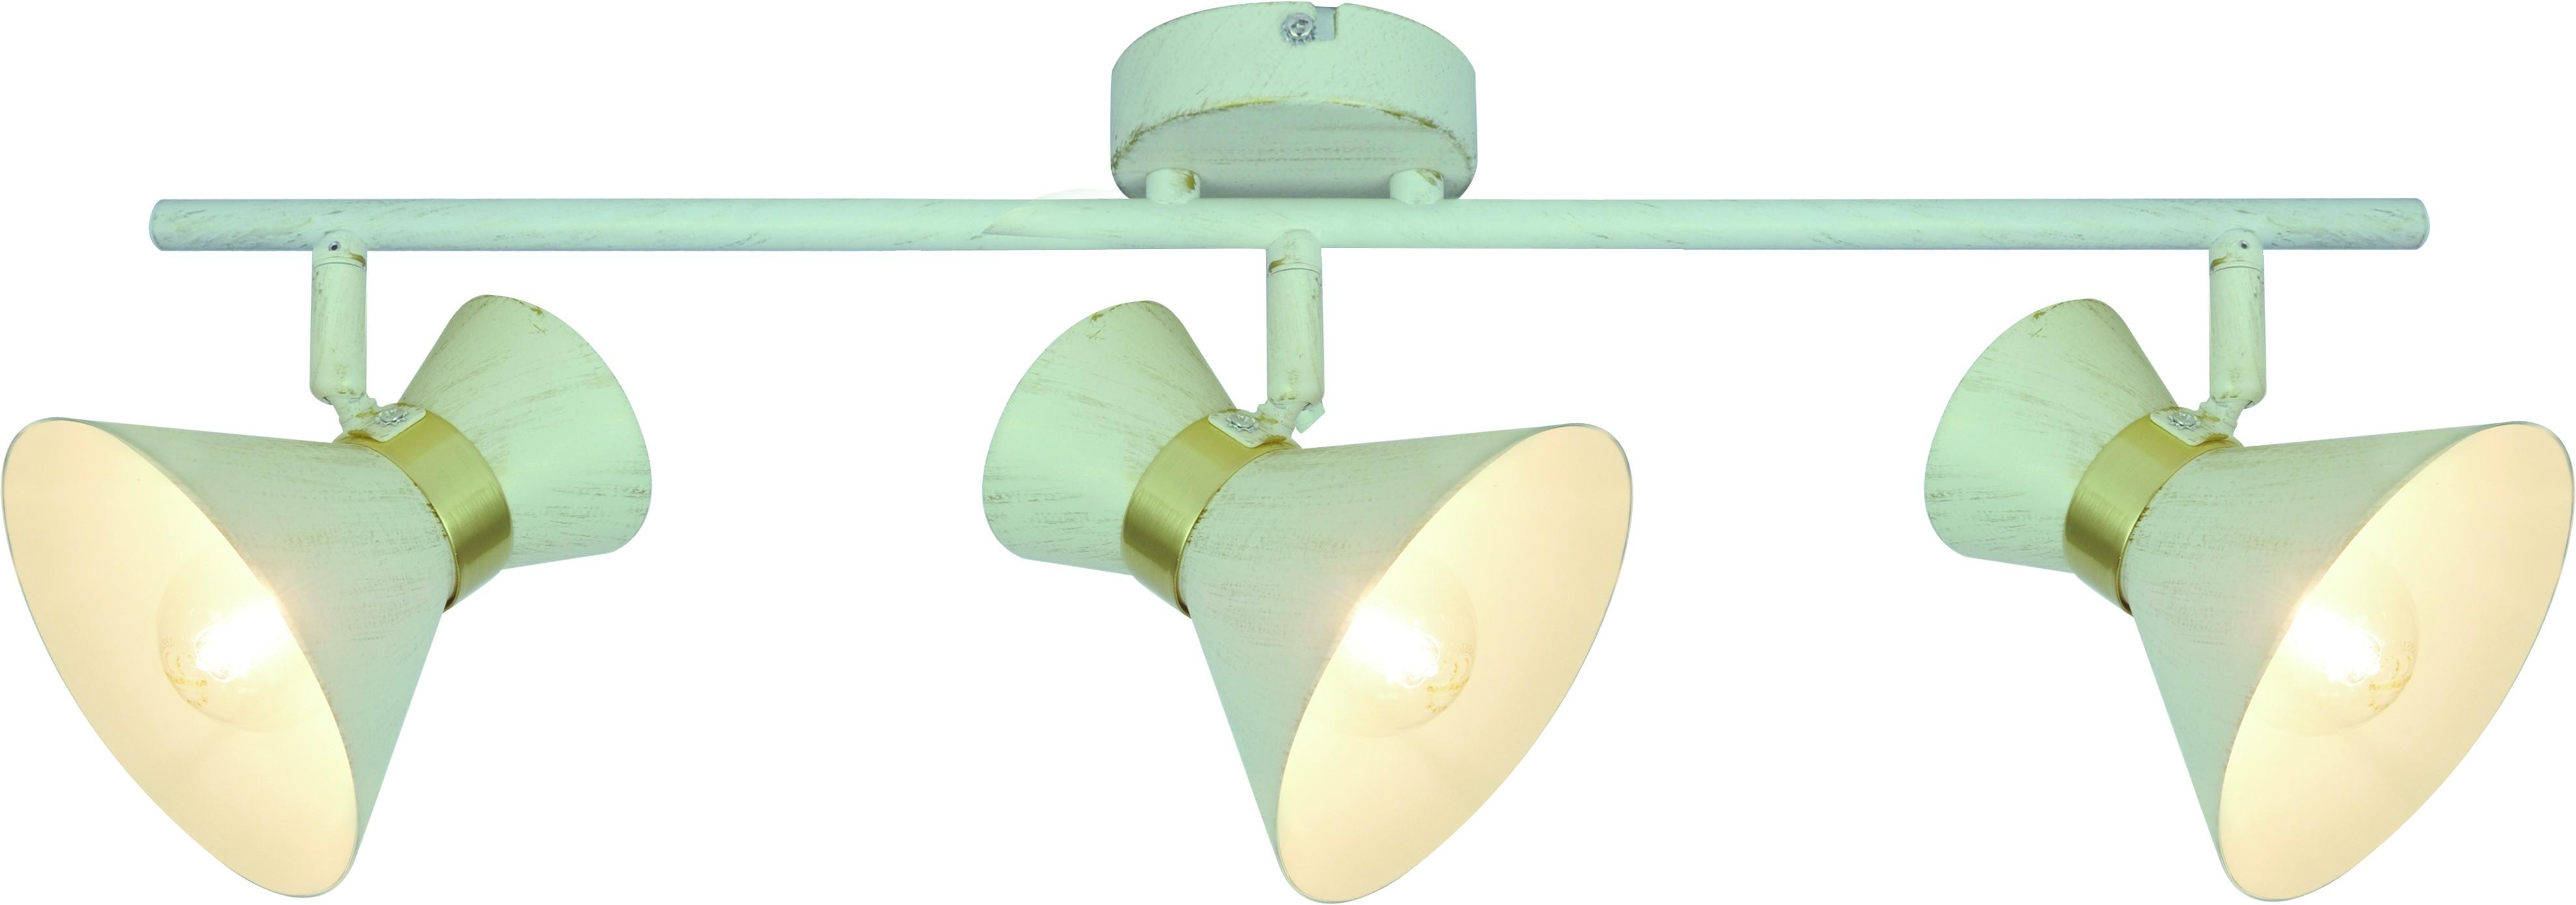 Спот Arte lamp A1406pl-3wg спот baltimore a1406pl 3wg arte lamp 1177869